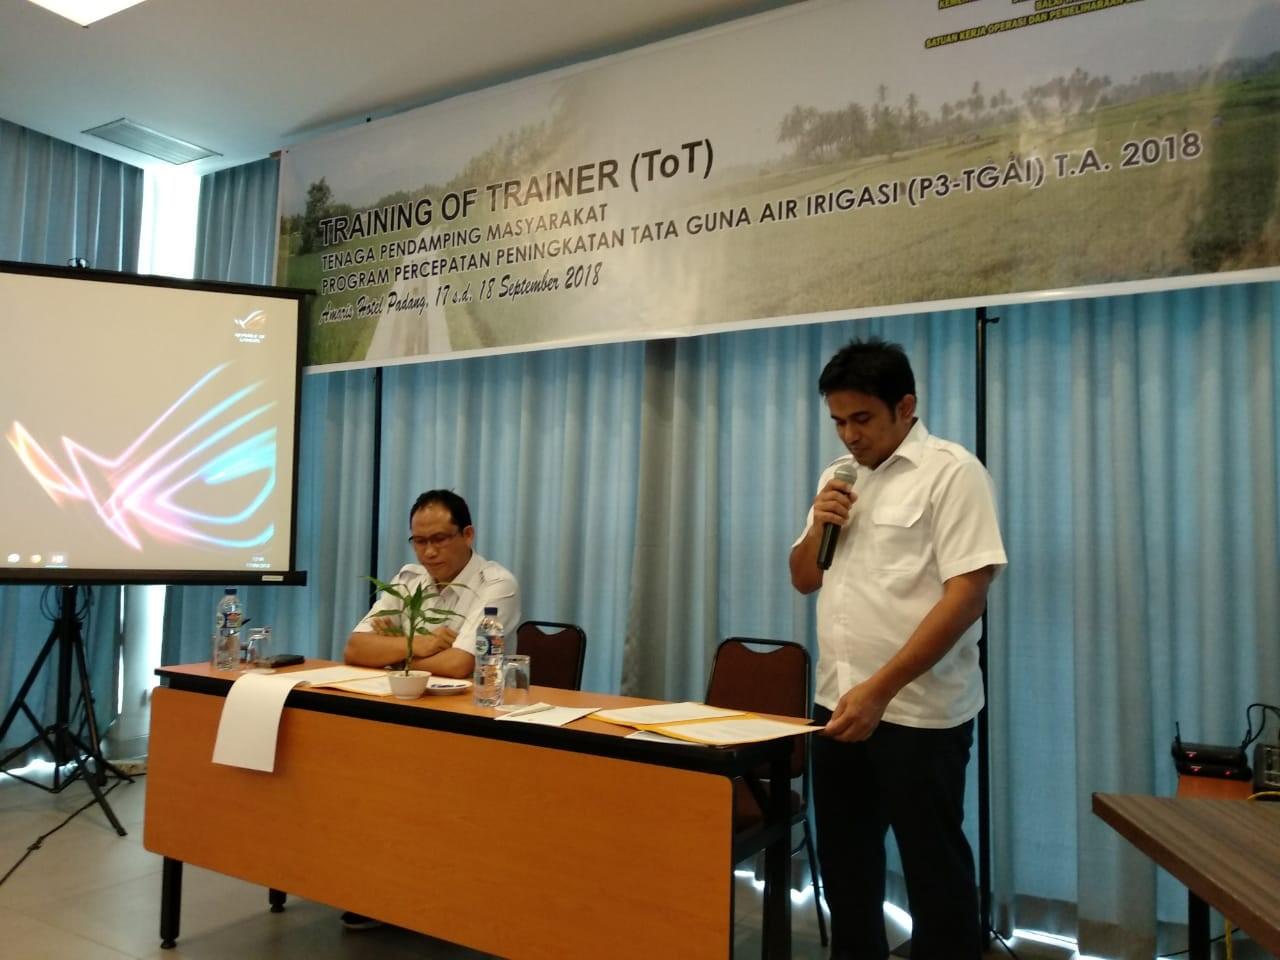 TOT Tahap III Tenaga Pendamping Masyarakat dalam P3-TGAI TA. 2018